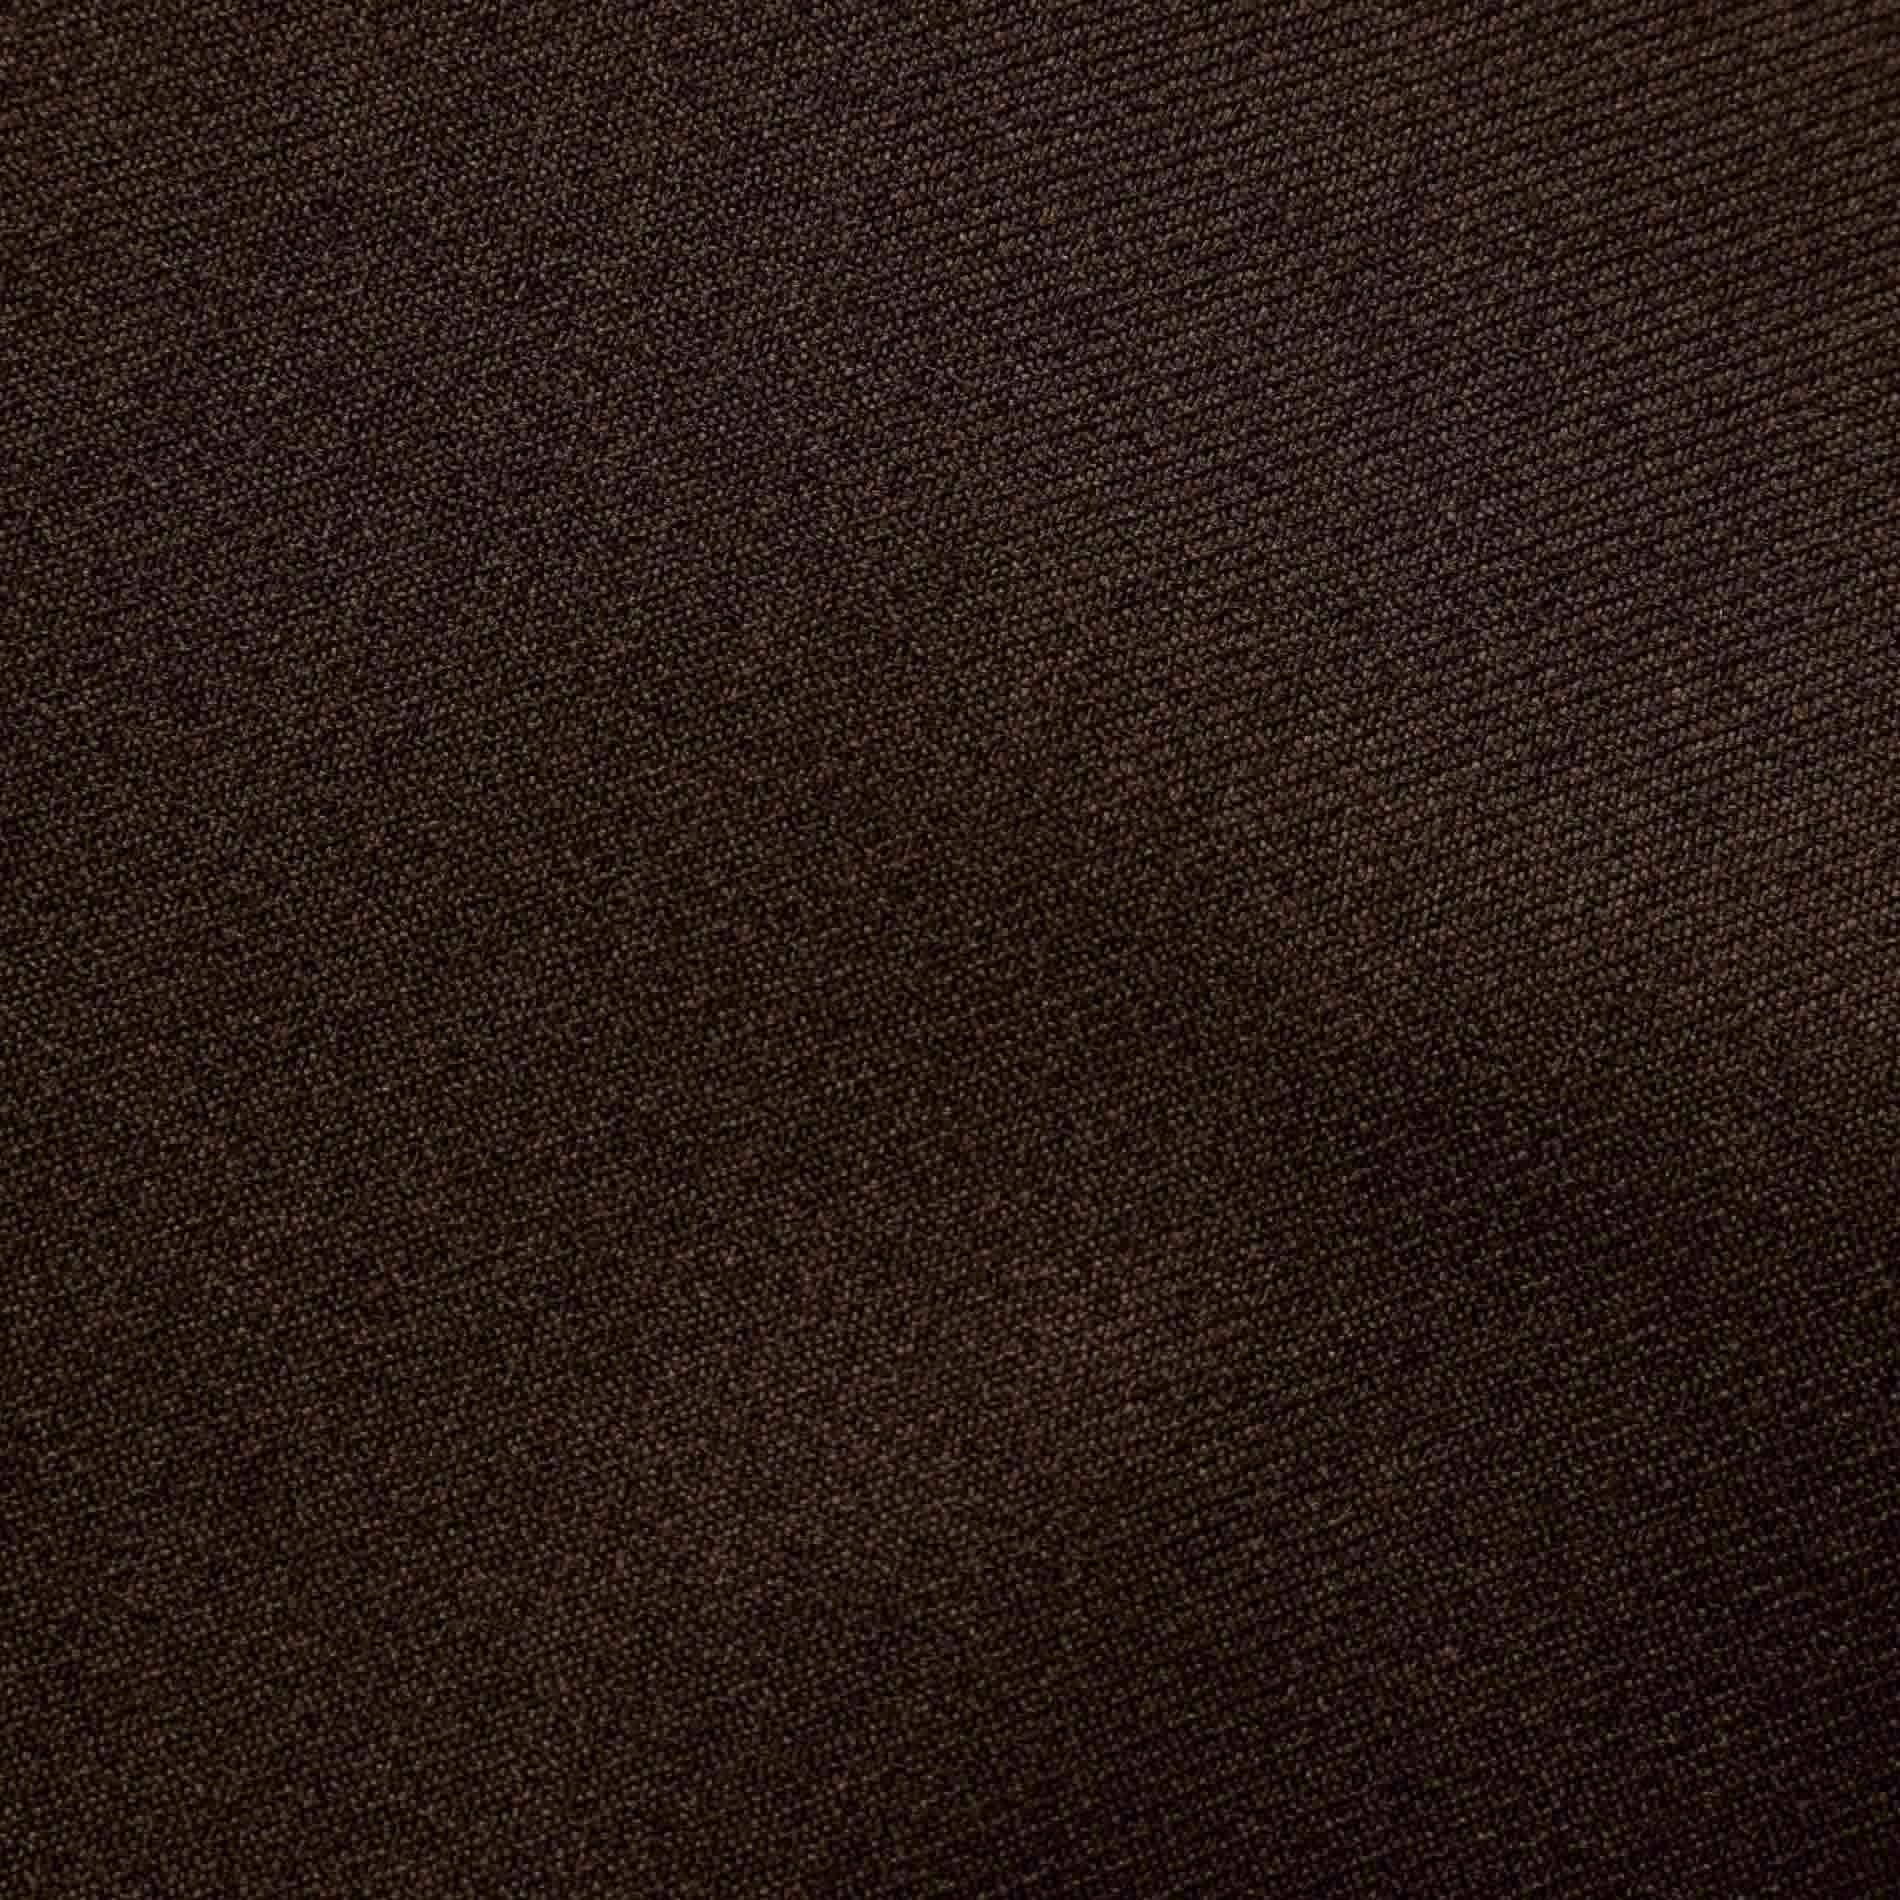 GREY LABEL 【RUSPER(ラスパー)】ポリエステルサージ